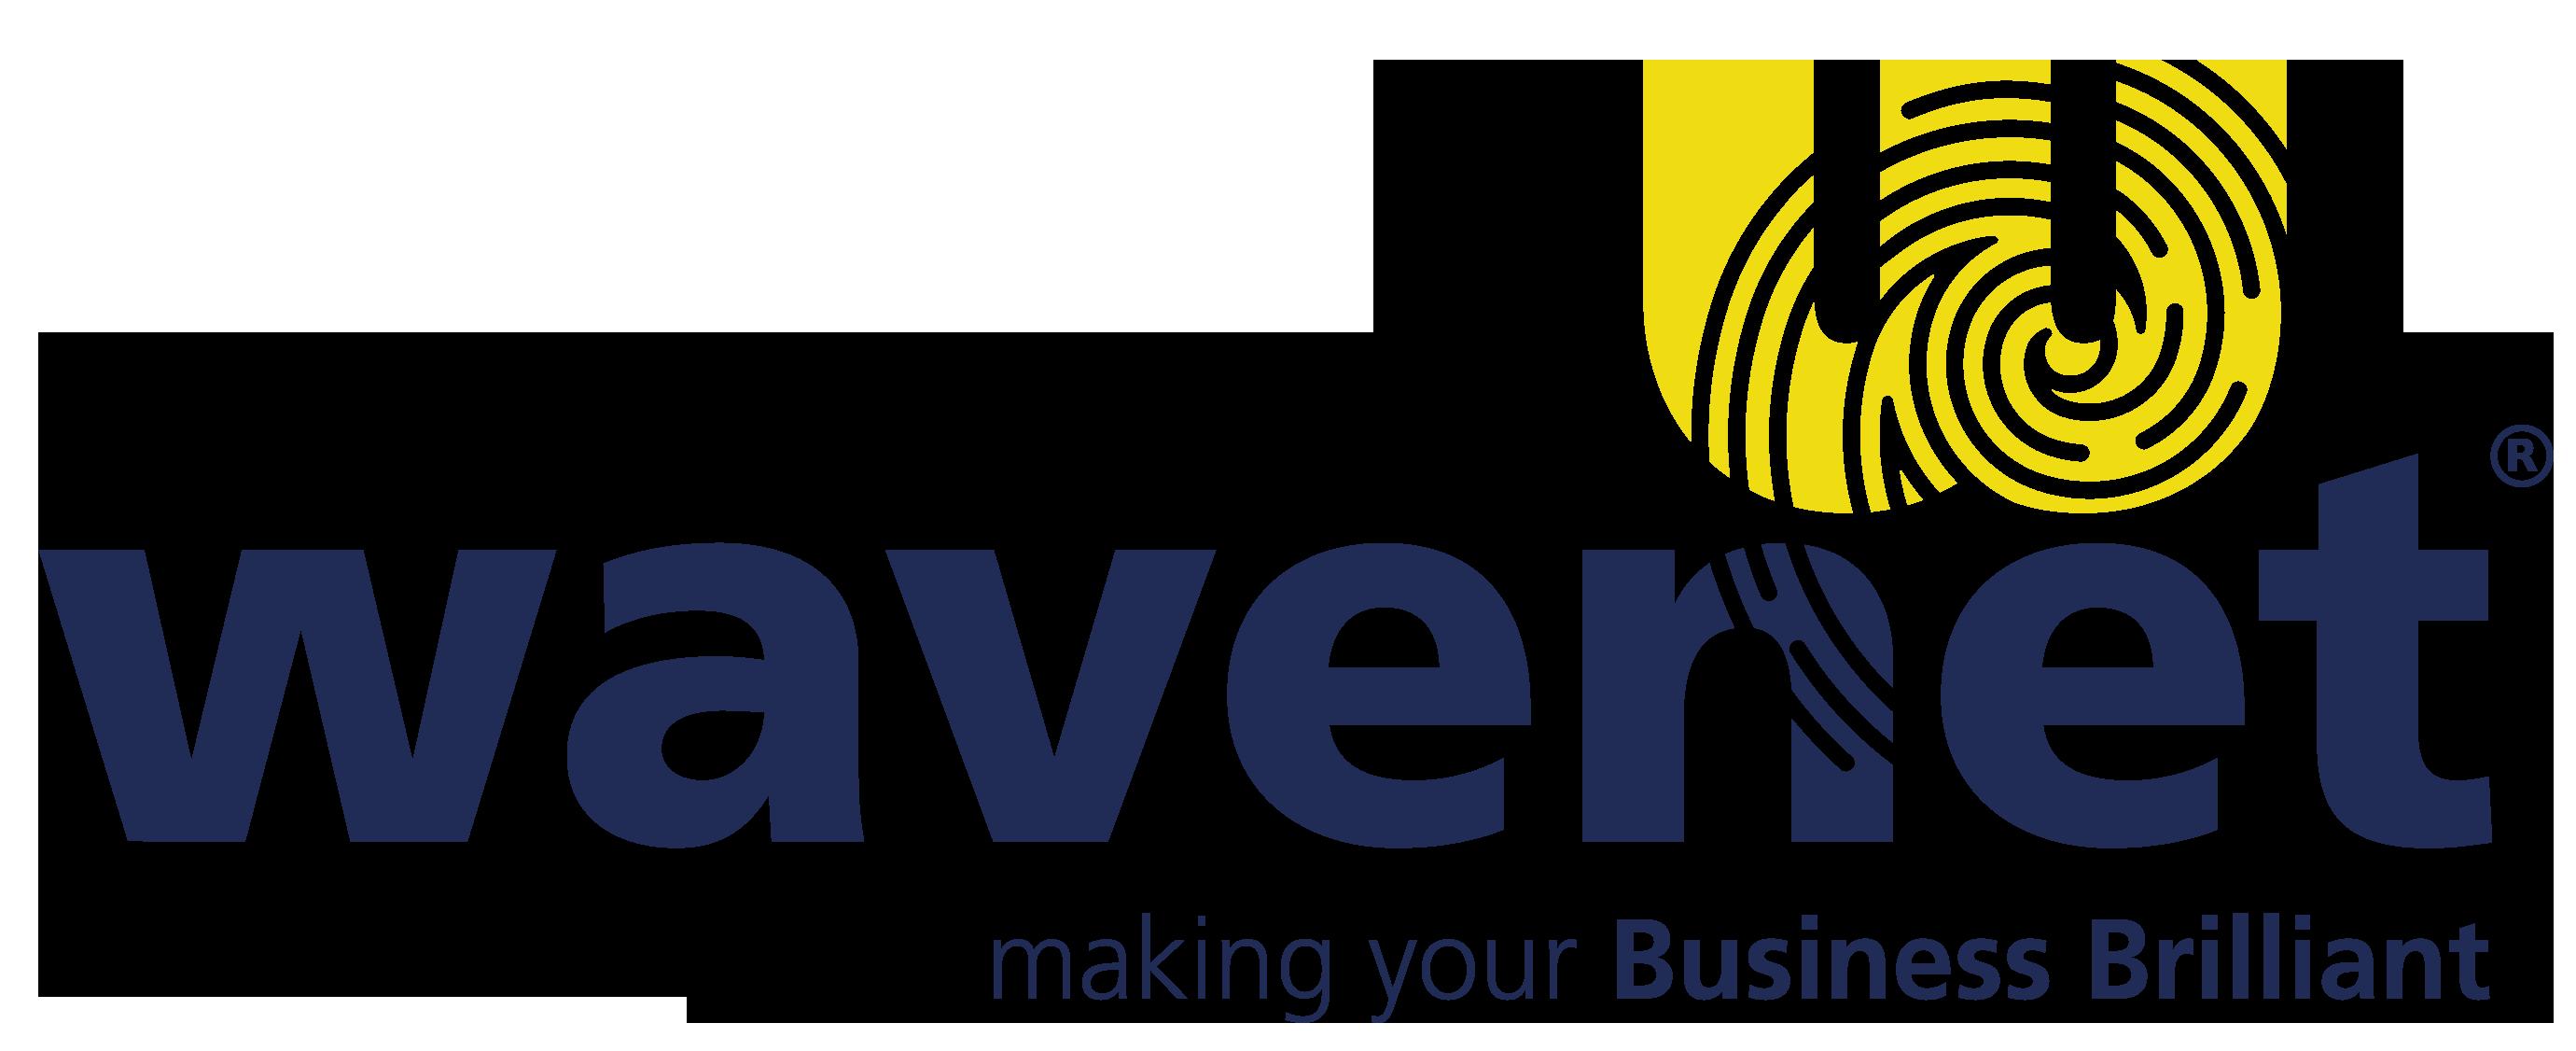 Wavenet Logo in Blue (Transparent Background) (1)